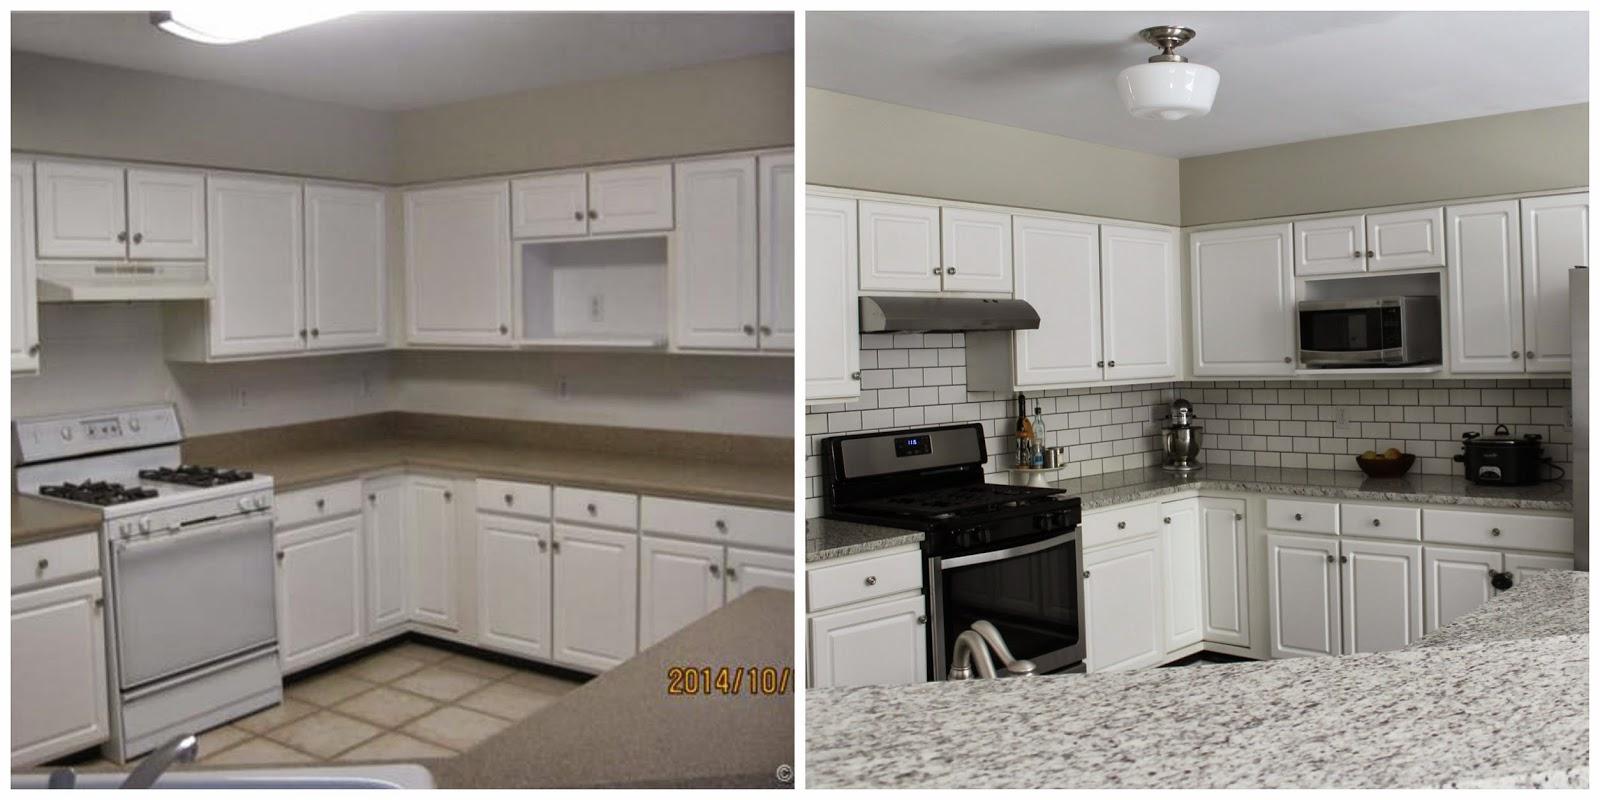 Replacing fluorescent light fixture - Replace Fluorescent Light Fixture In Kitchen Choosing Kitchen